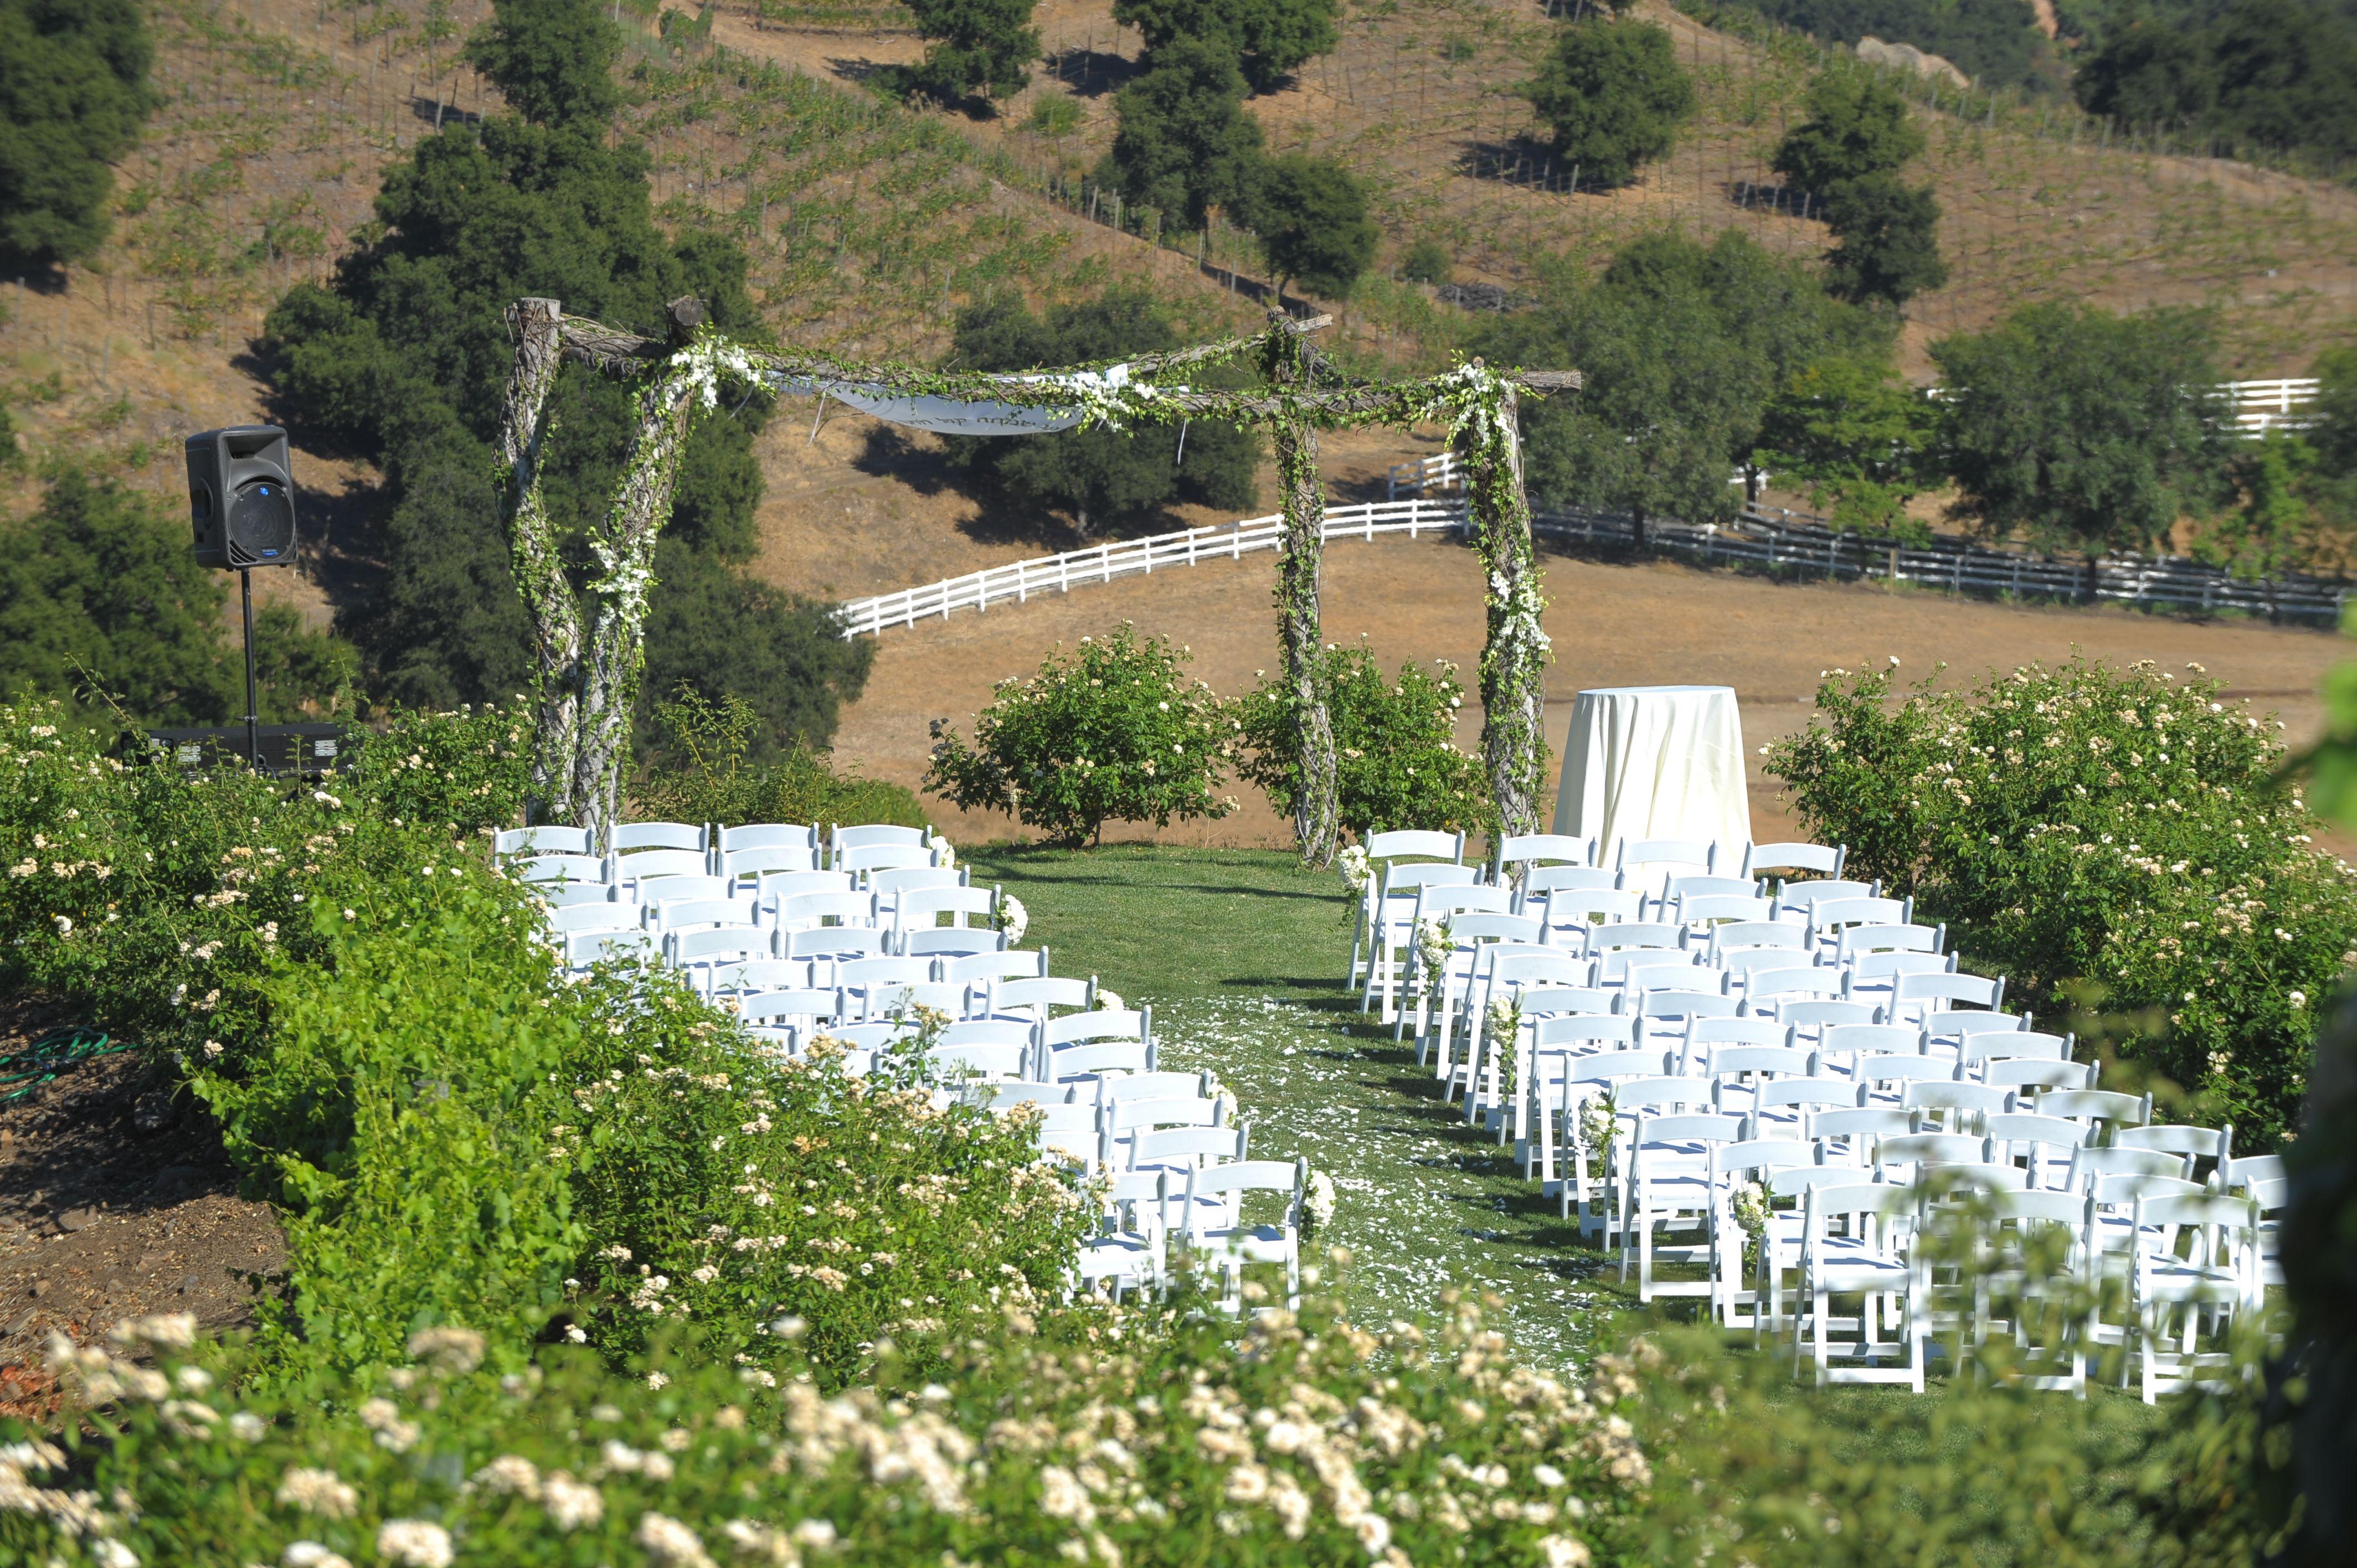 Saddlerock Ranch Wedding.Romantic Vineyard Weddings At Saddlerock Ranch Chateau Le Dome In